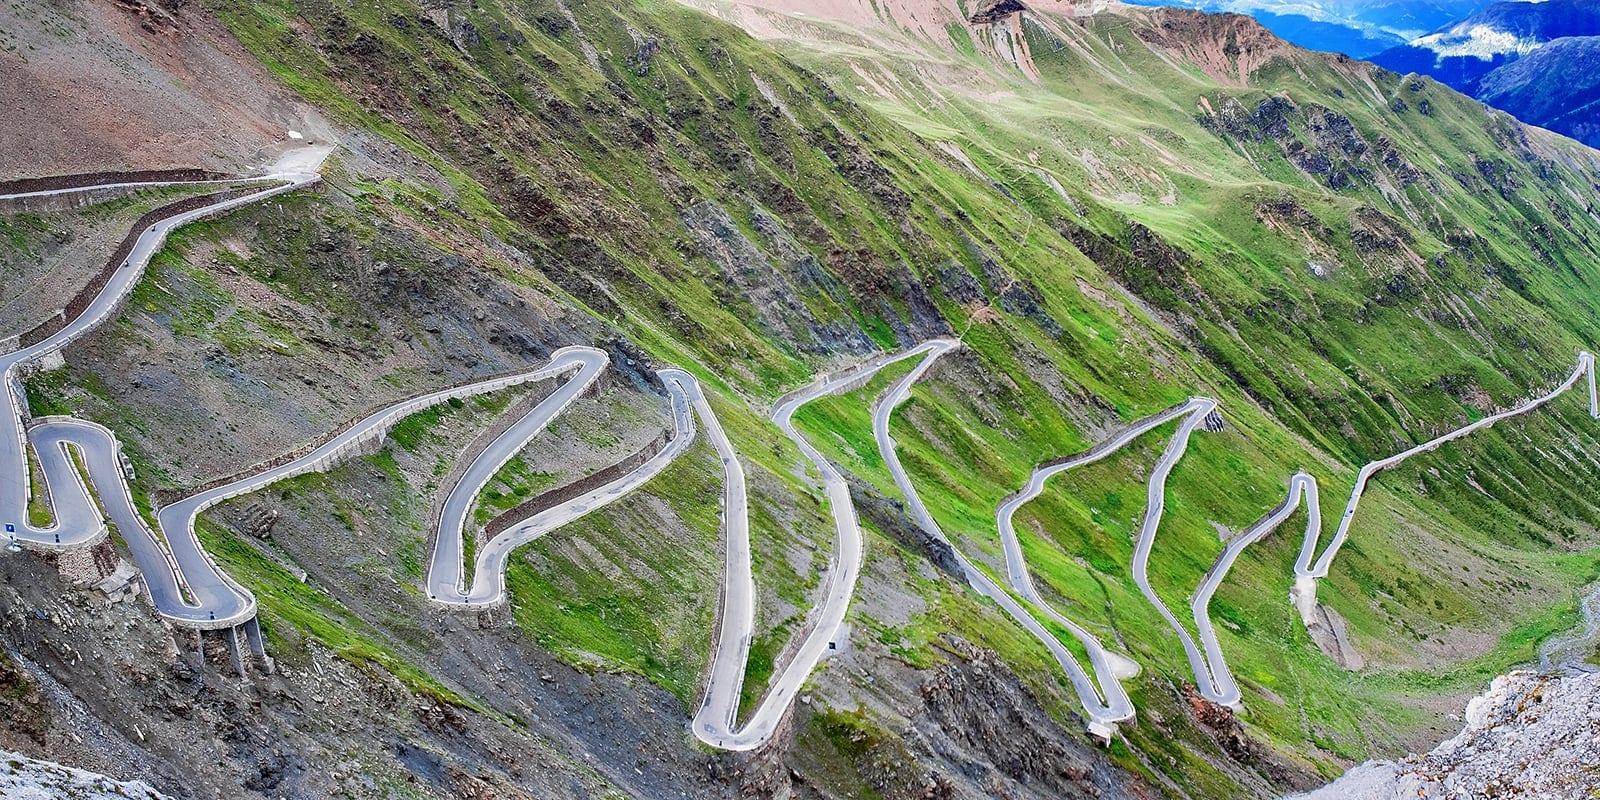 serpentine mountain road in Italian Alps, Stelvio pass, Passo de